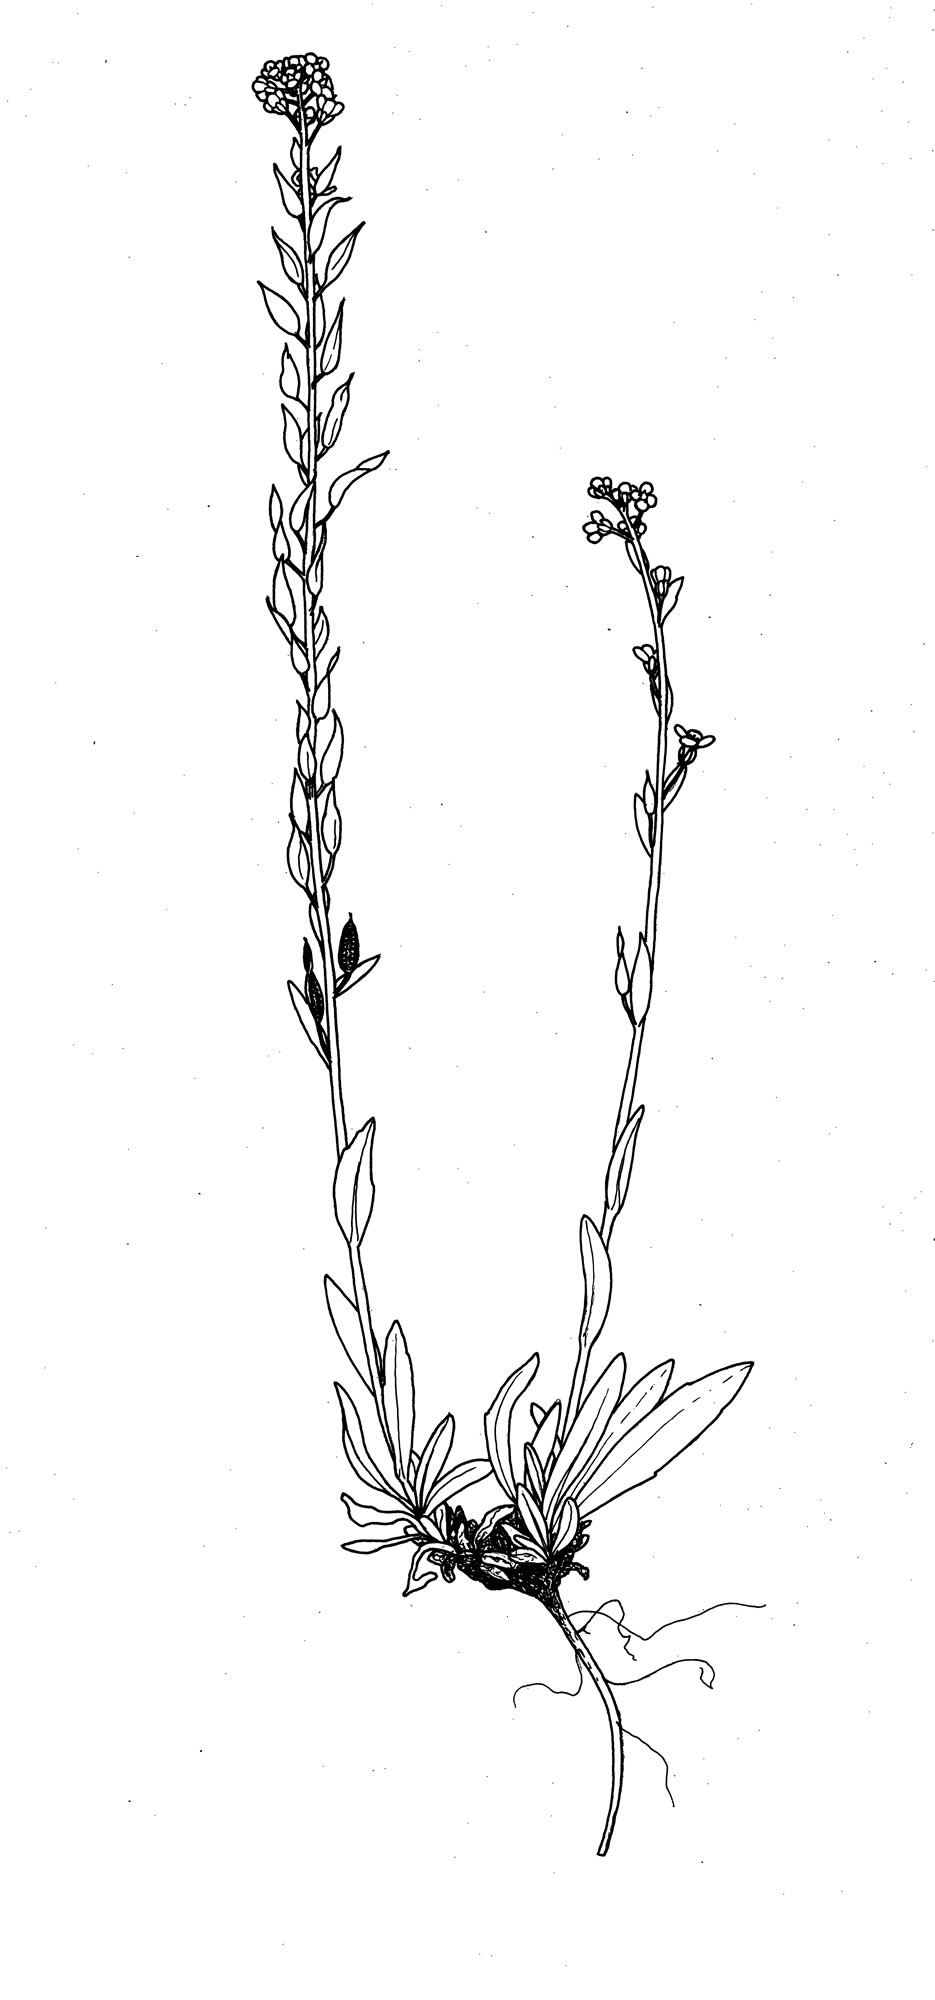 Draba aurea Vahl. ex Hornem.